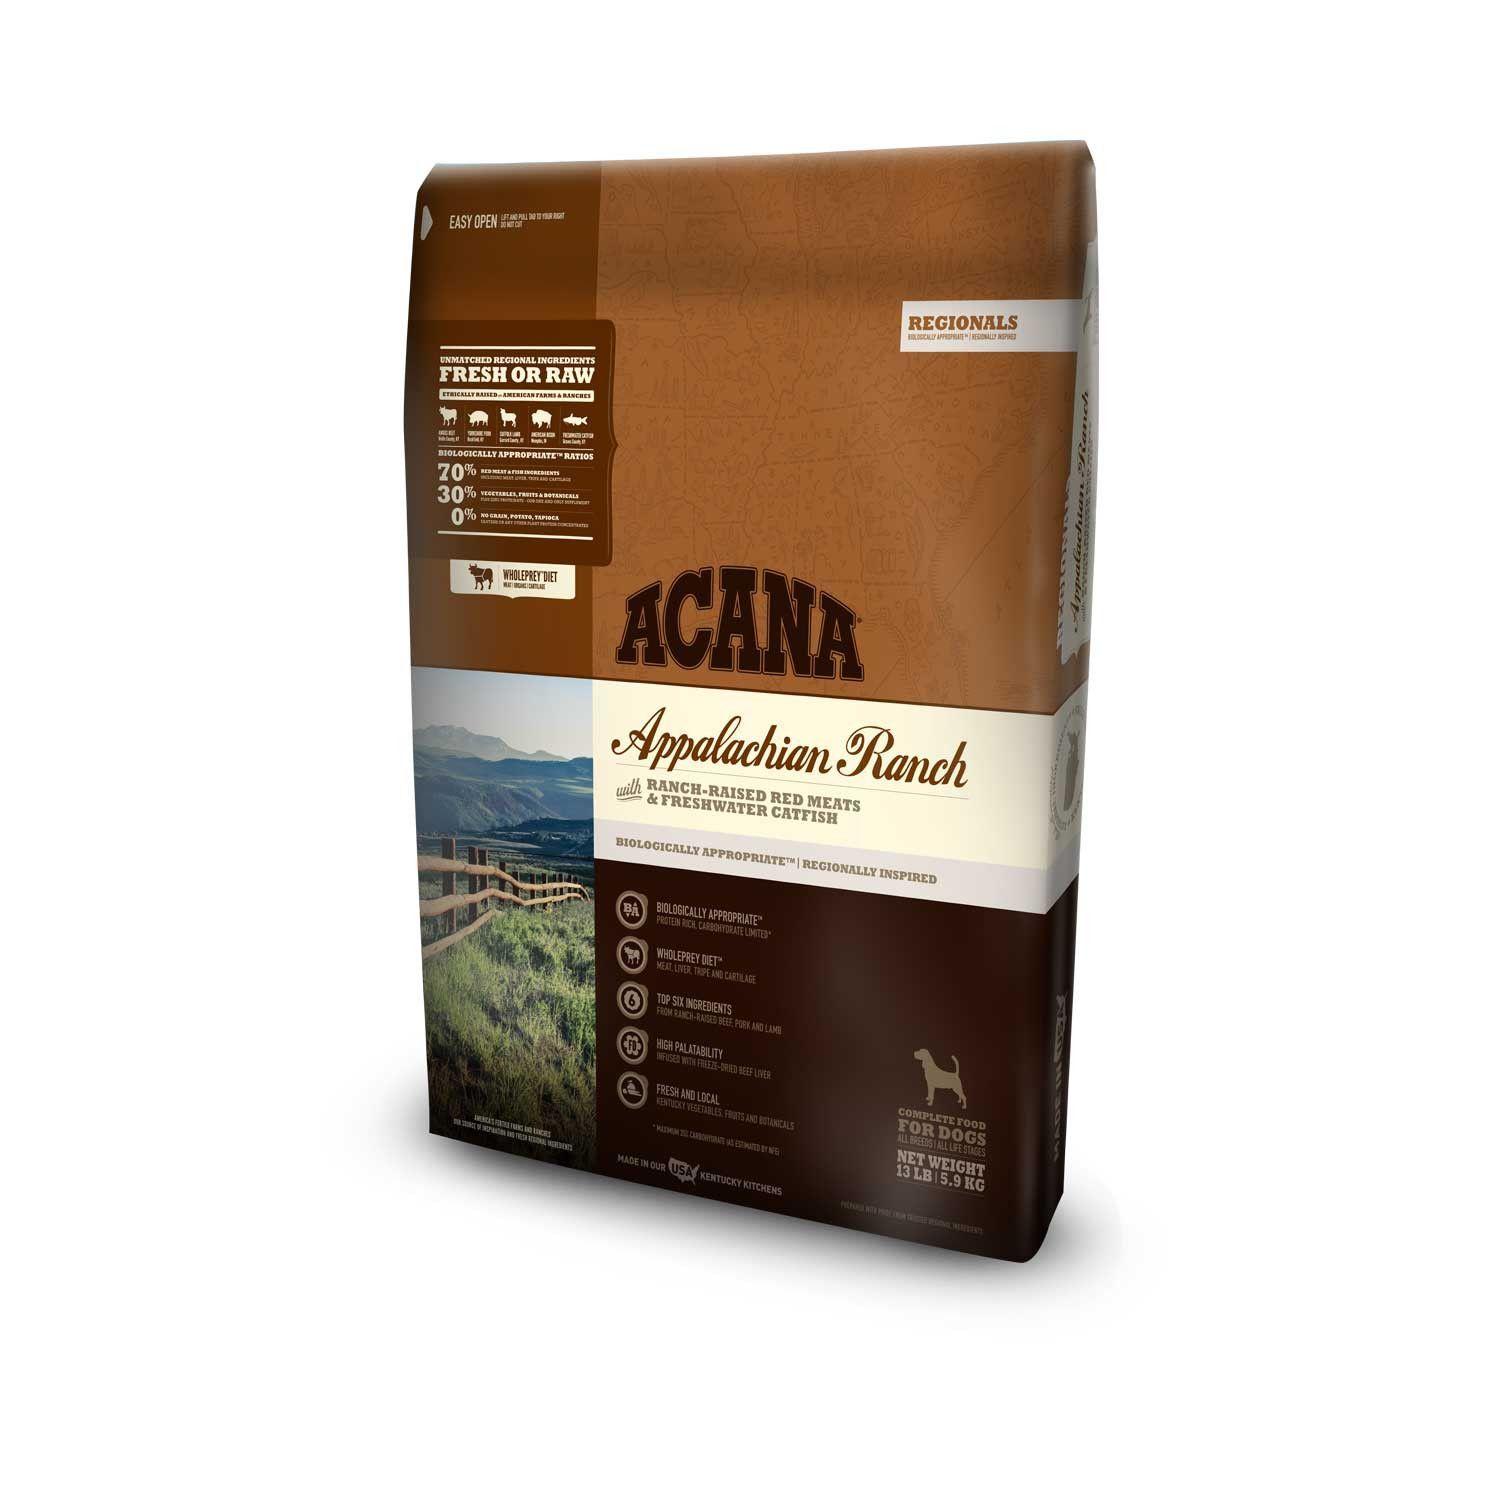 Acana Dog Food Regionals Applachian Ranch Acana Dog Food Dry